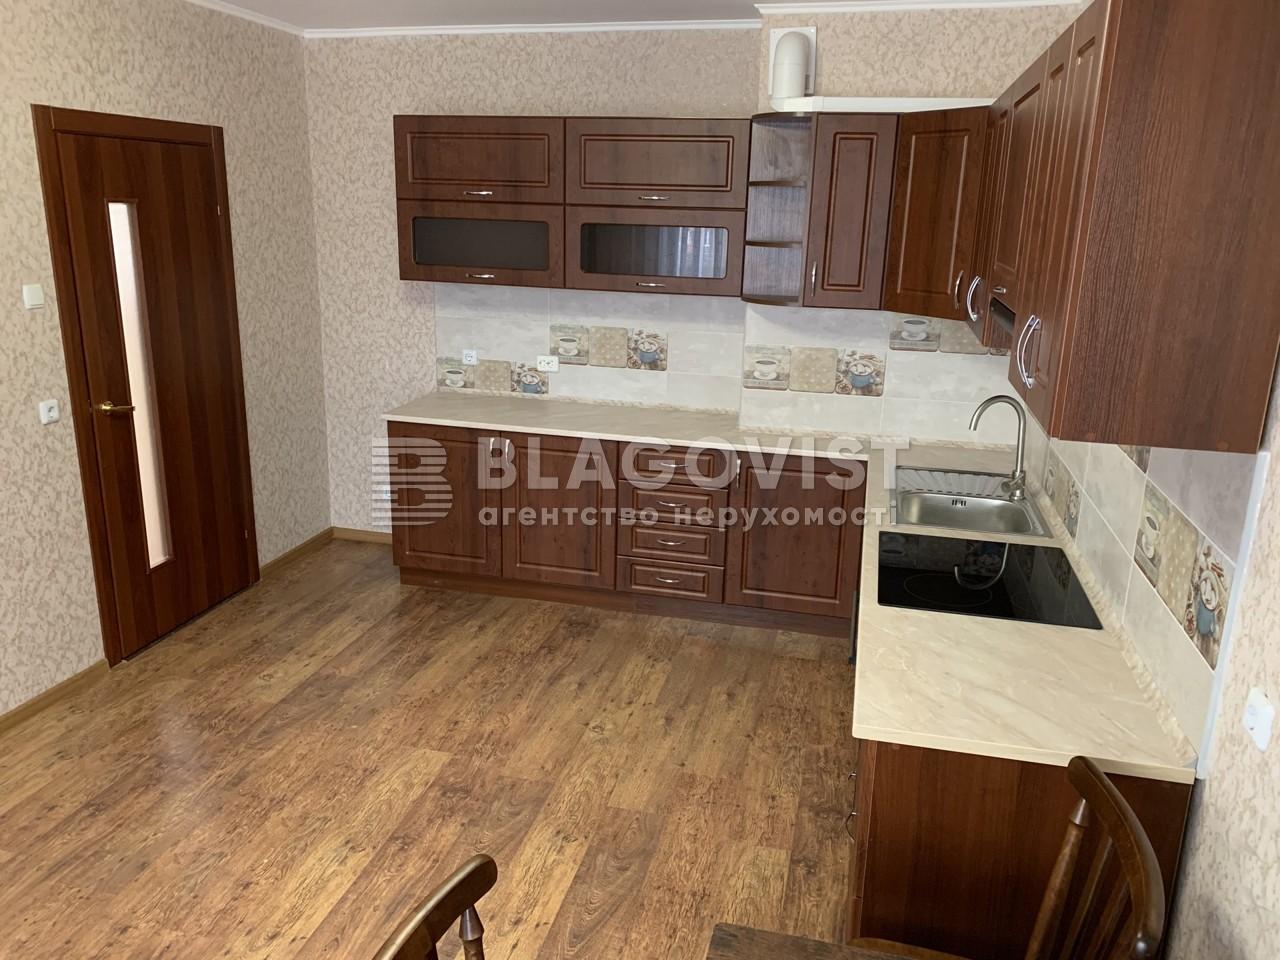 Квартира R-24472, Ясиноватский пер., 11, Киев - Фото 10